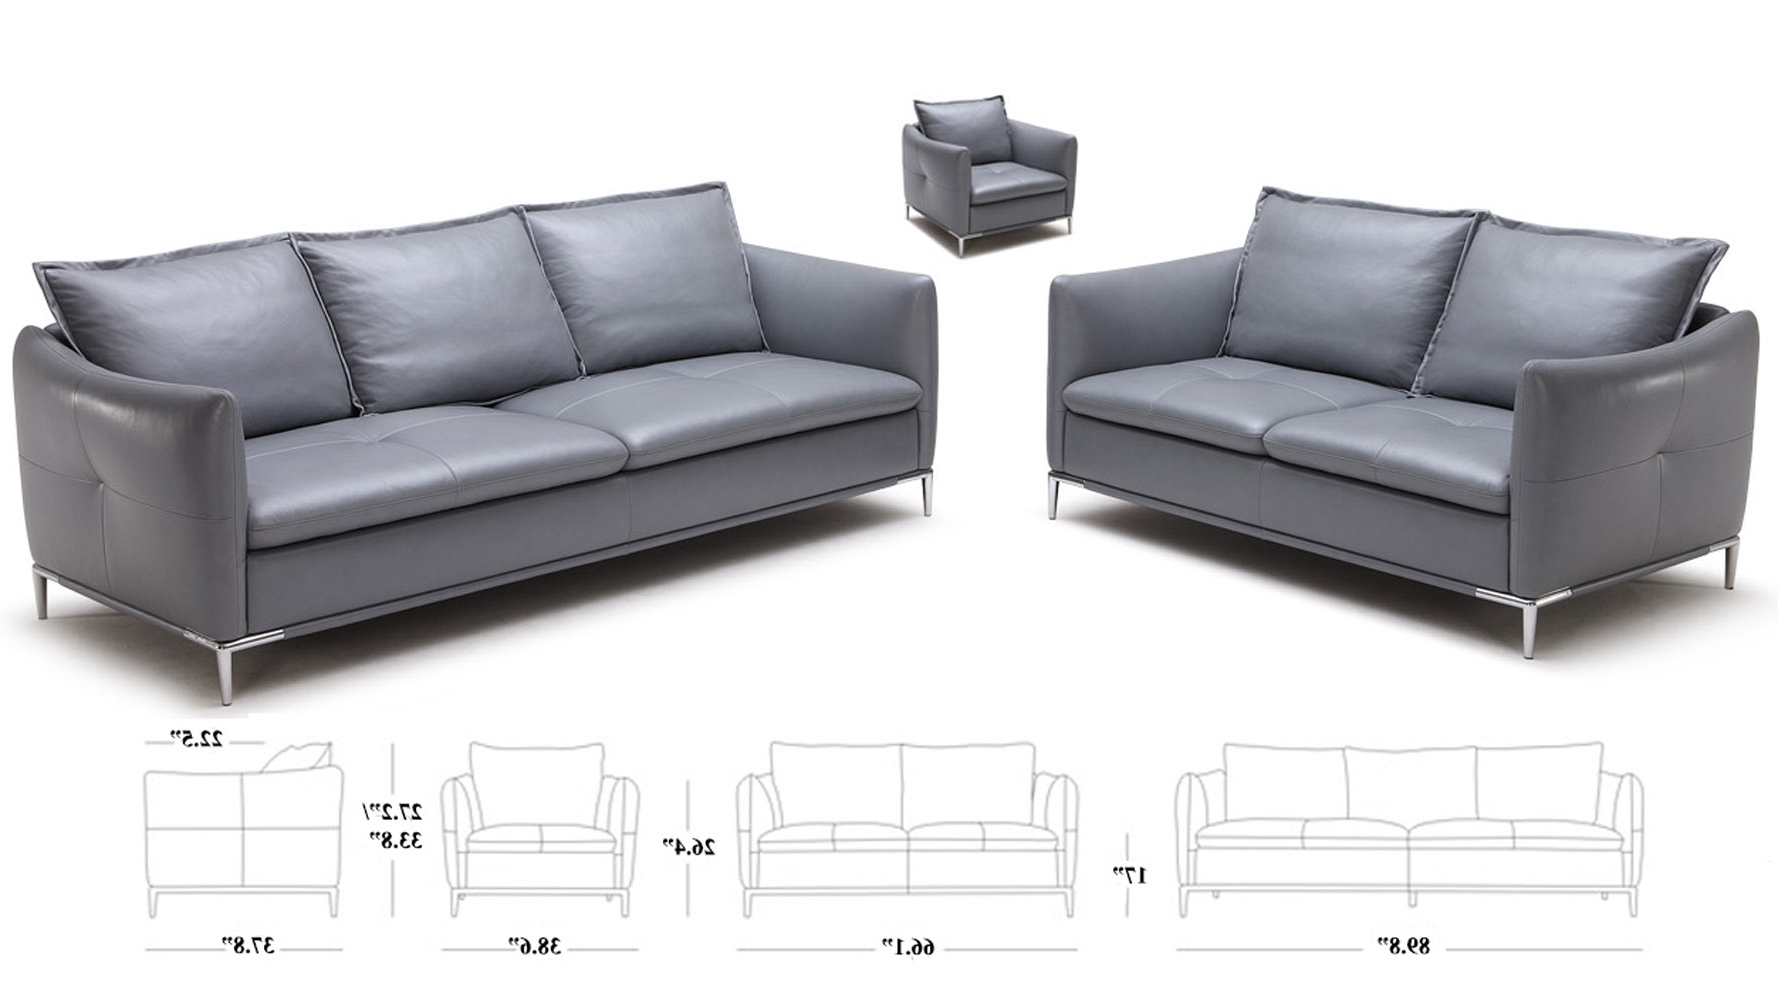 Zuri Furniture With Regard To Well Known Bristol Sofas (View 20 of 20)